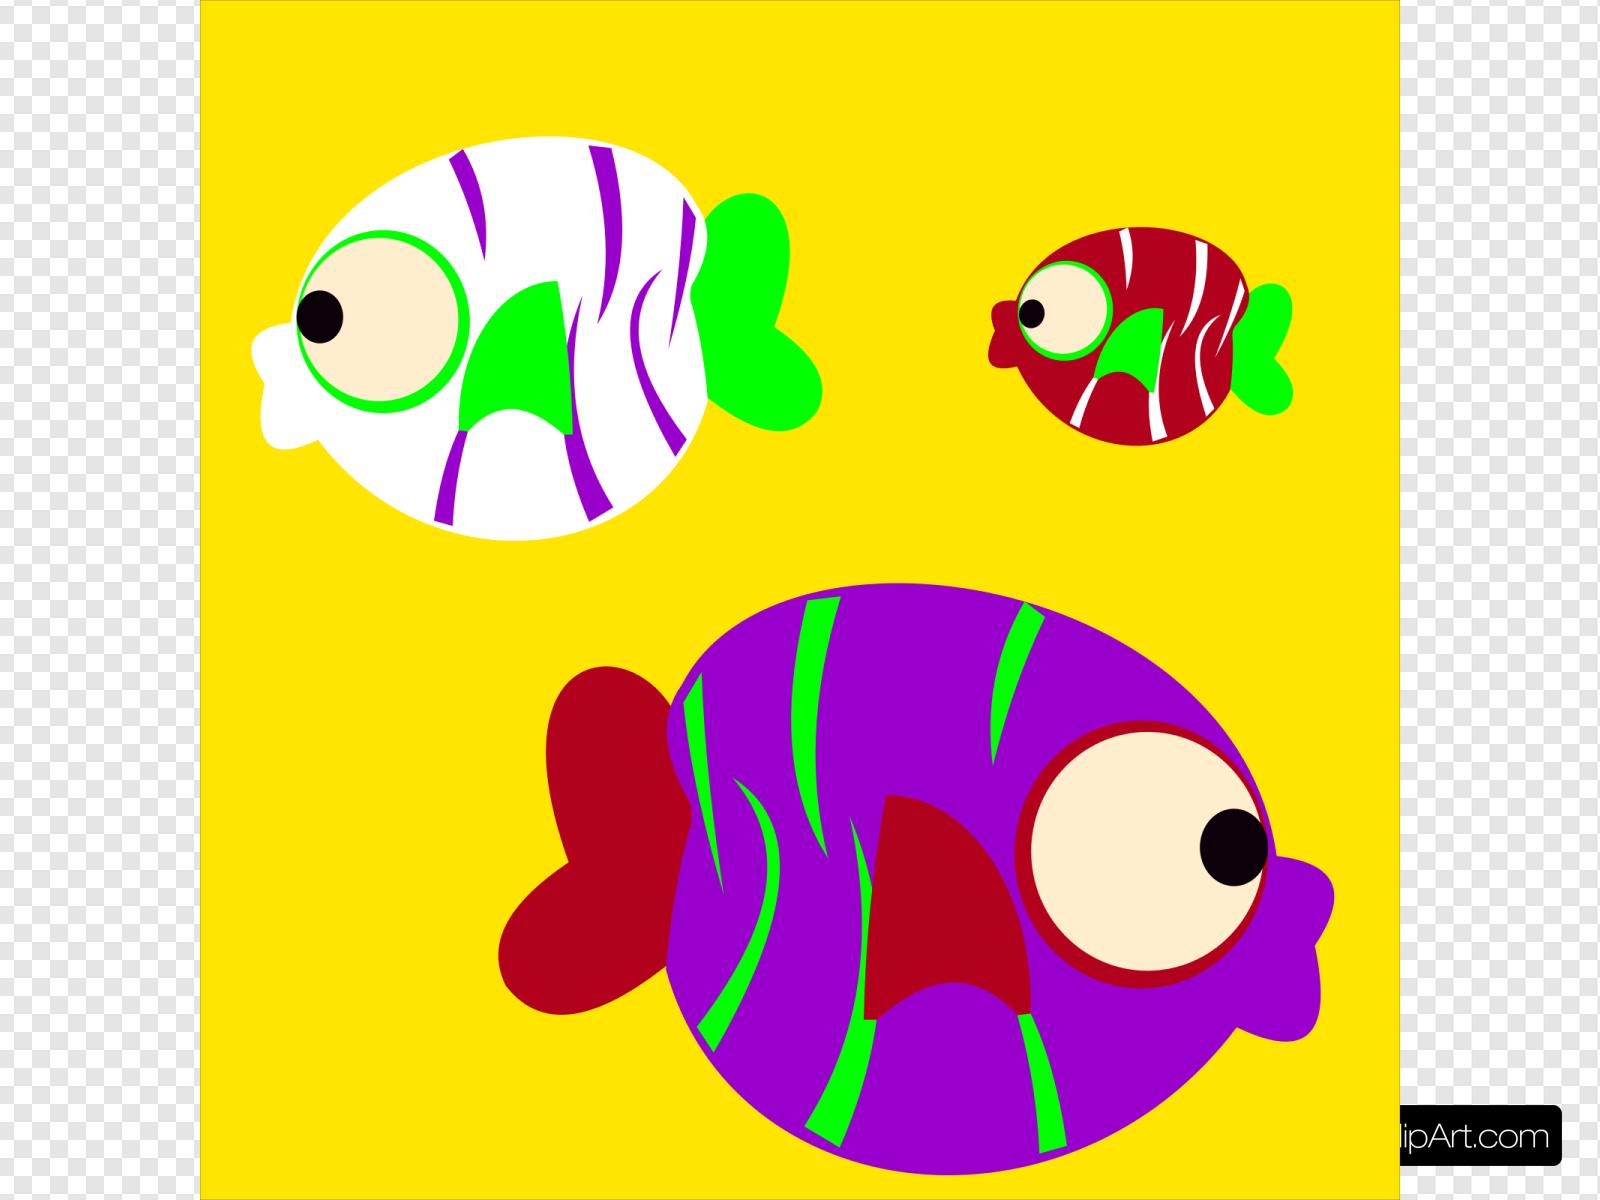 Imagenes de peces clipart svg royalty free download Peces Clip art, Icon and SVG - SVG Clipart svg royalty free download